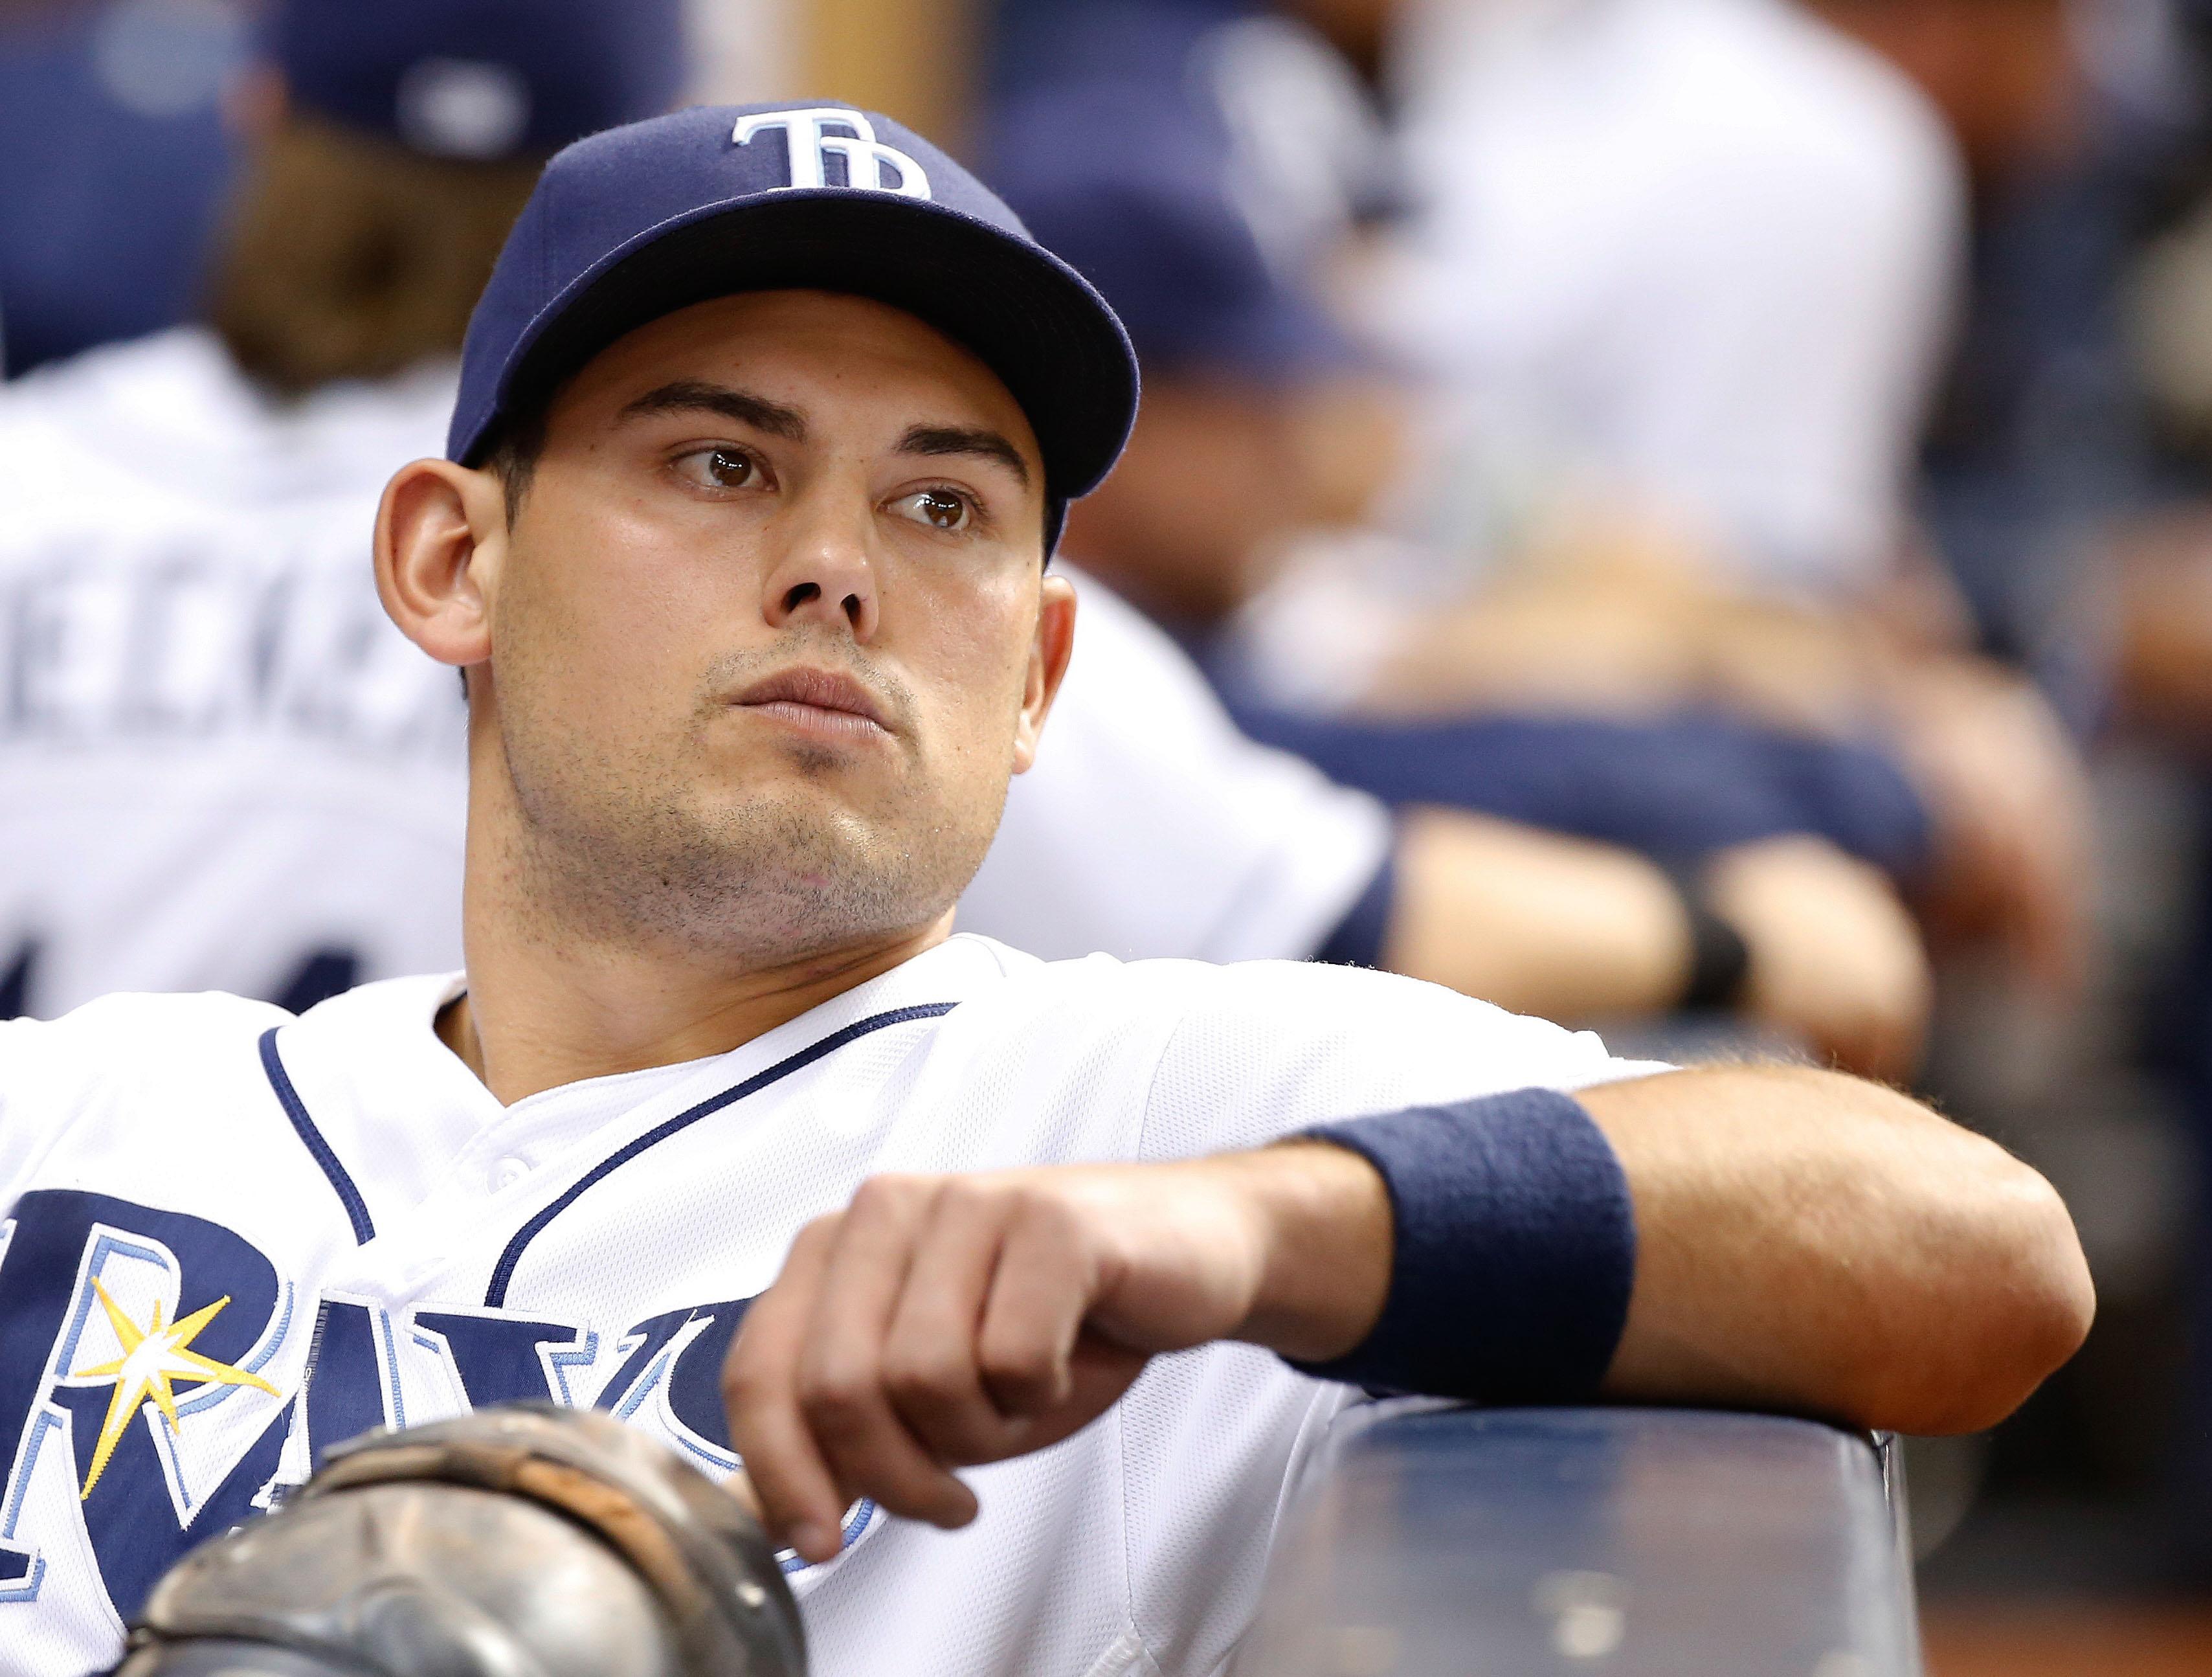 Tampa Bay Rays: Baseball Prospectus Not a Fan  of Luke Maile